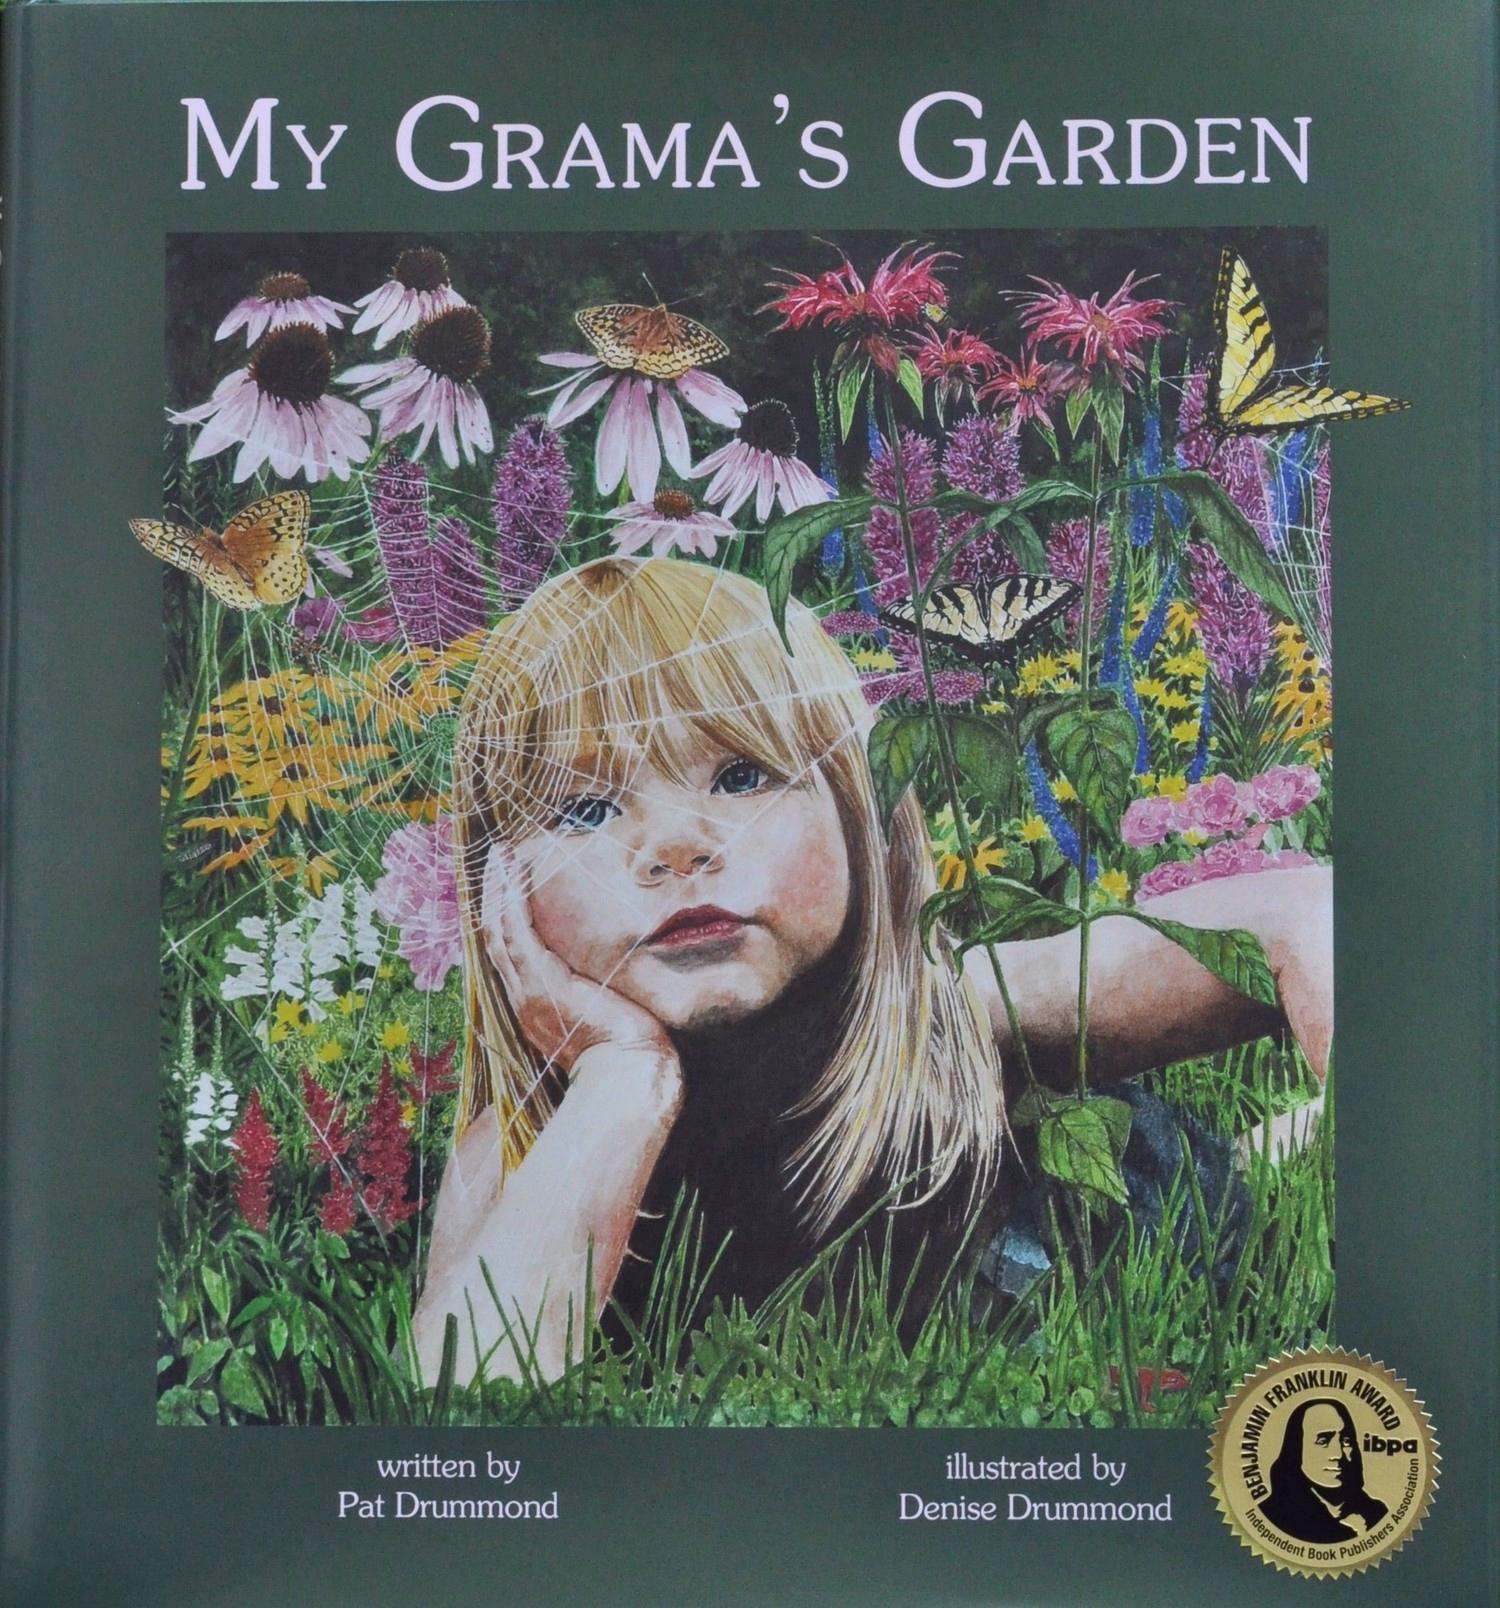 My Grama's Garden